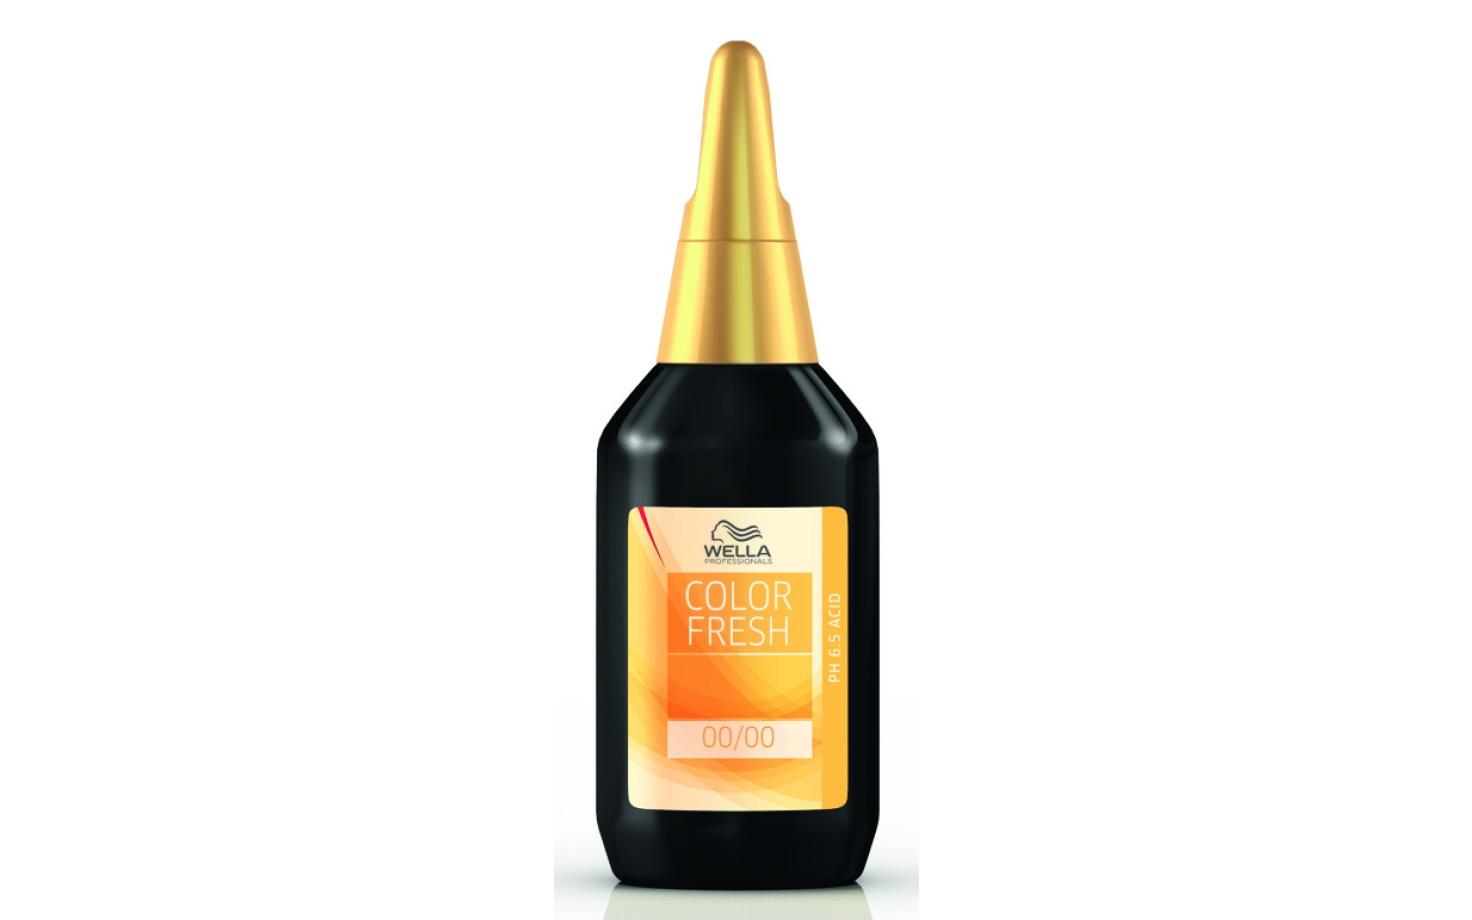 Wella Color Fresh Glanz-Tönung 75 ml ph 6.5-Acid 5/56 - hellbraun mahagoni violett